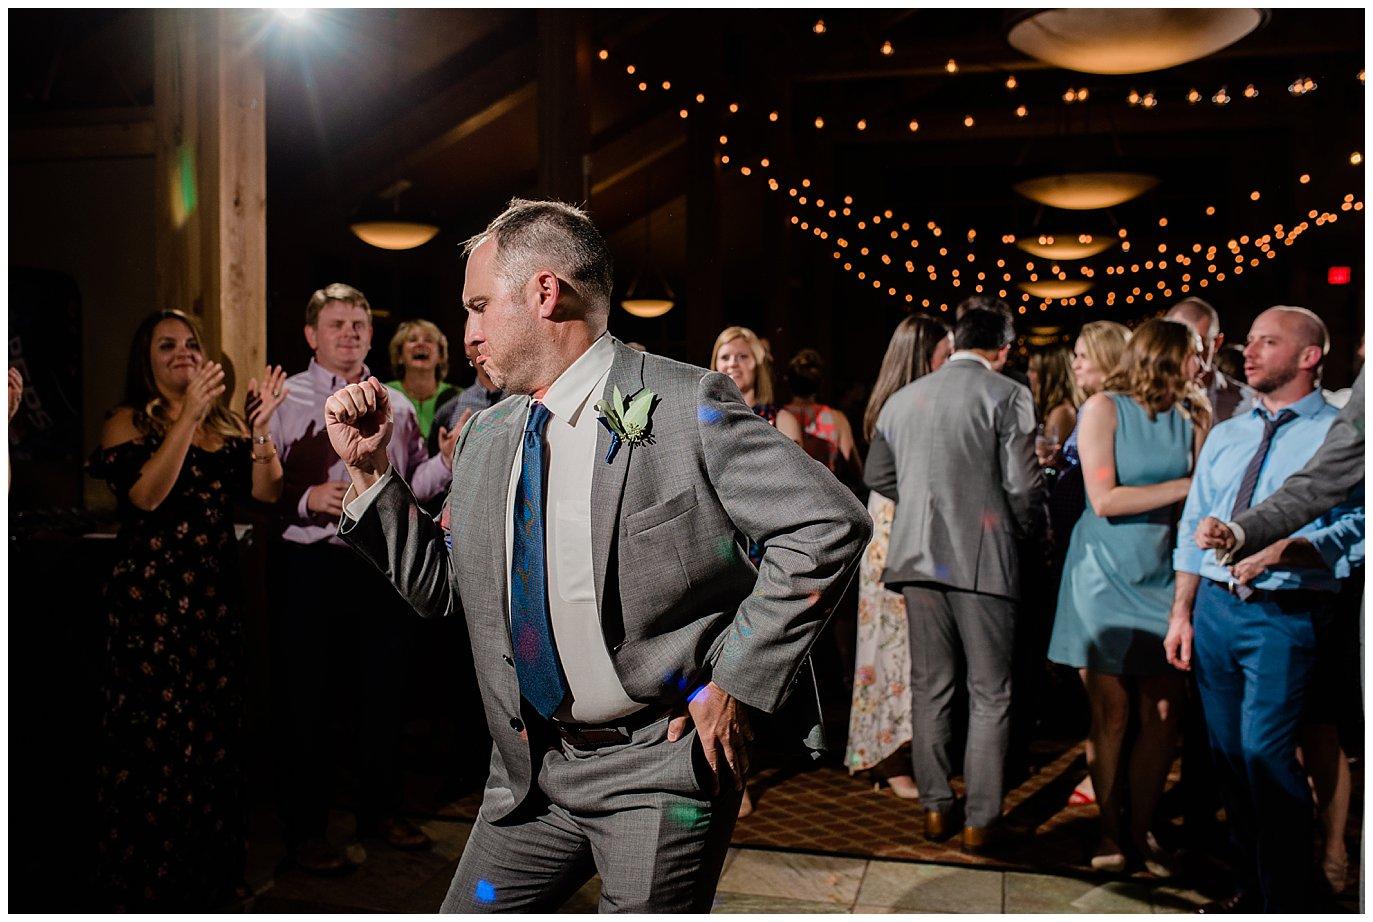 break dancing at Arapahoe Basin Black Mountain Lodge Wedding by Denver Wedding Photographer Jennie Crate